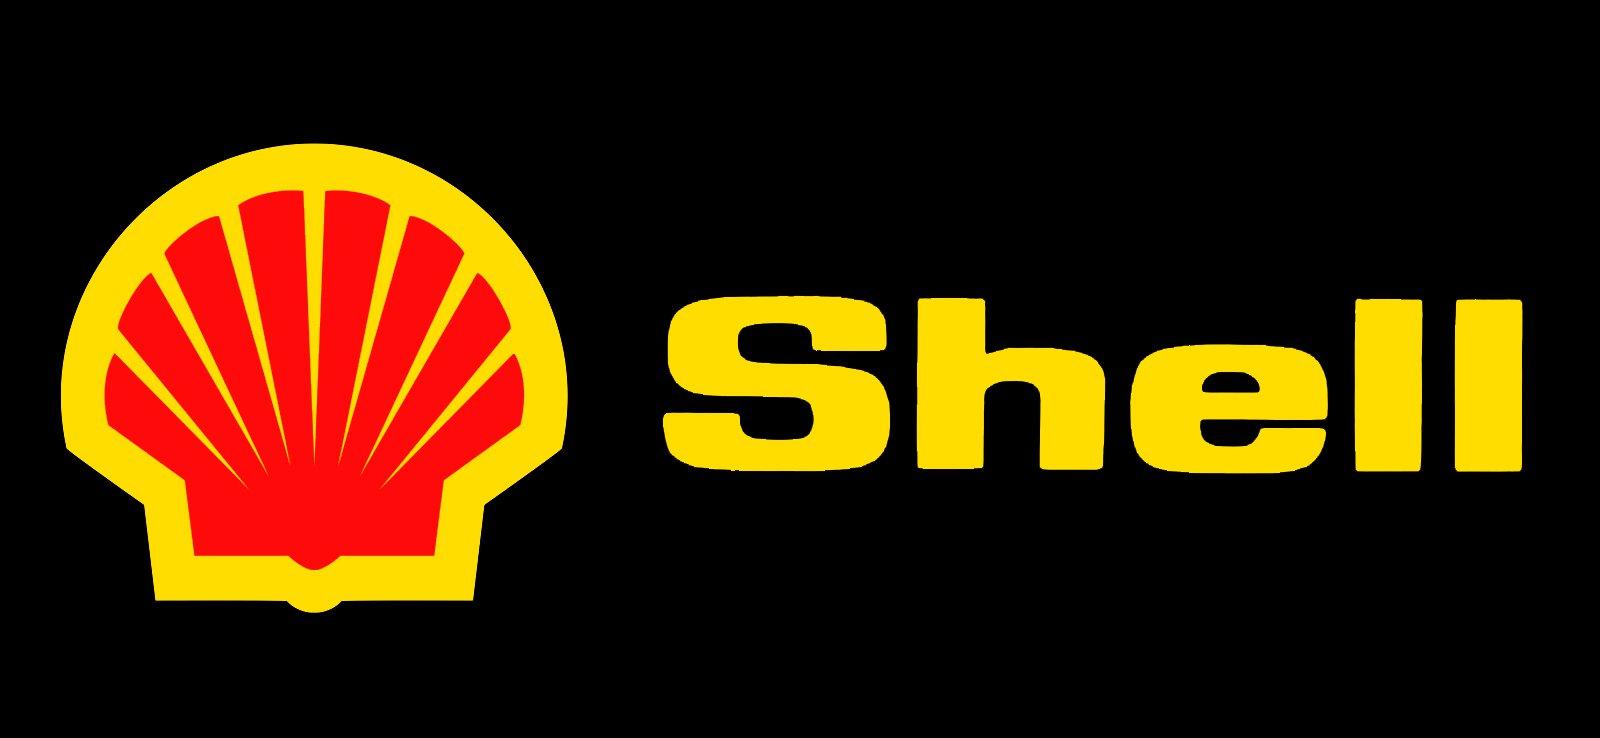 shell logo  shell symbol  meaning  history and evolution pfizer logo vector pfizer logo transparent